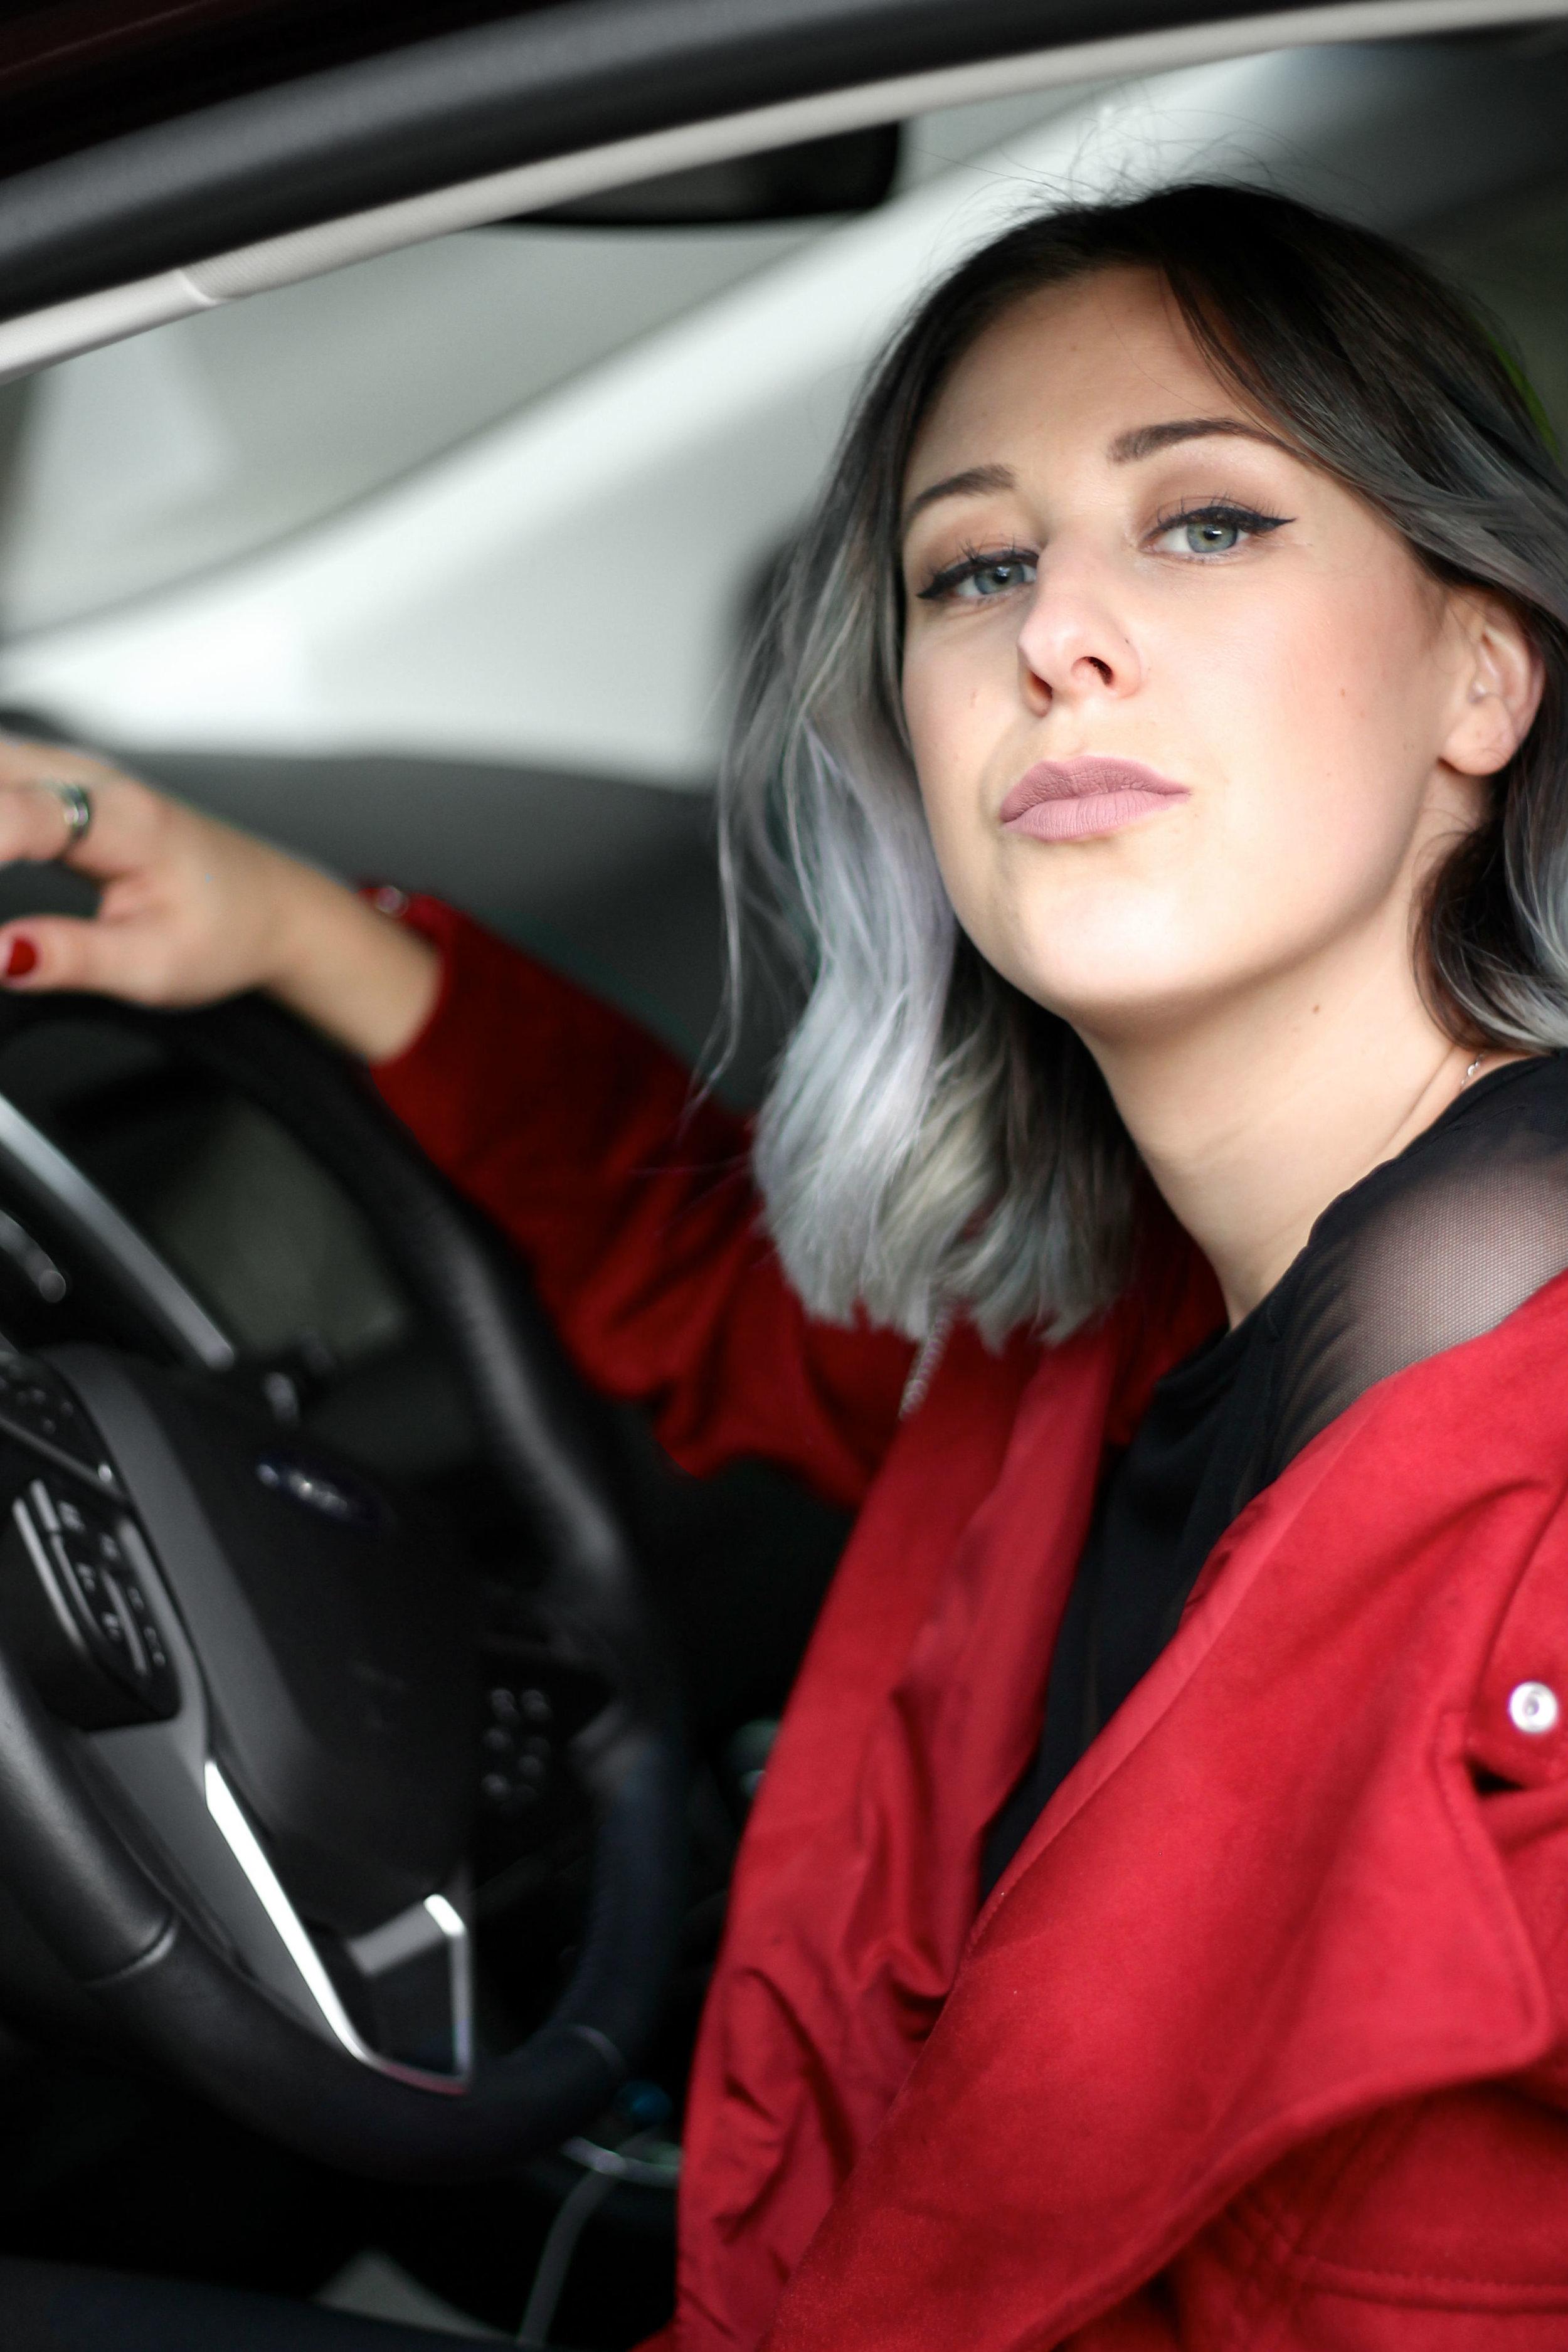 Bratty B works with Ford Edge Canada on a road-trip to Niagara Falls, ON with Elaisha Jade